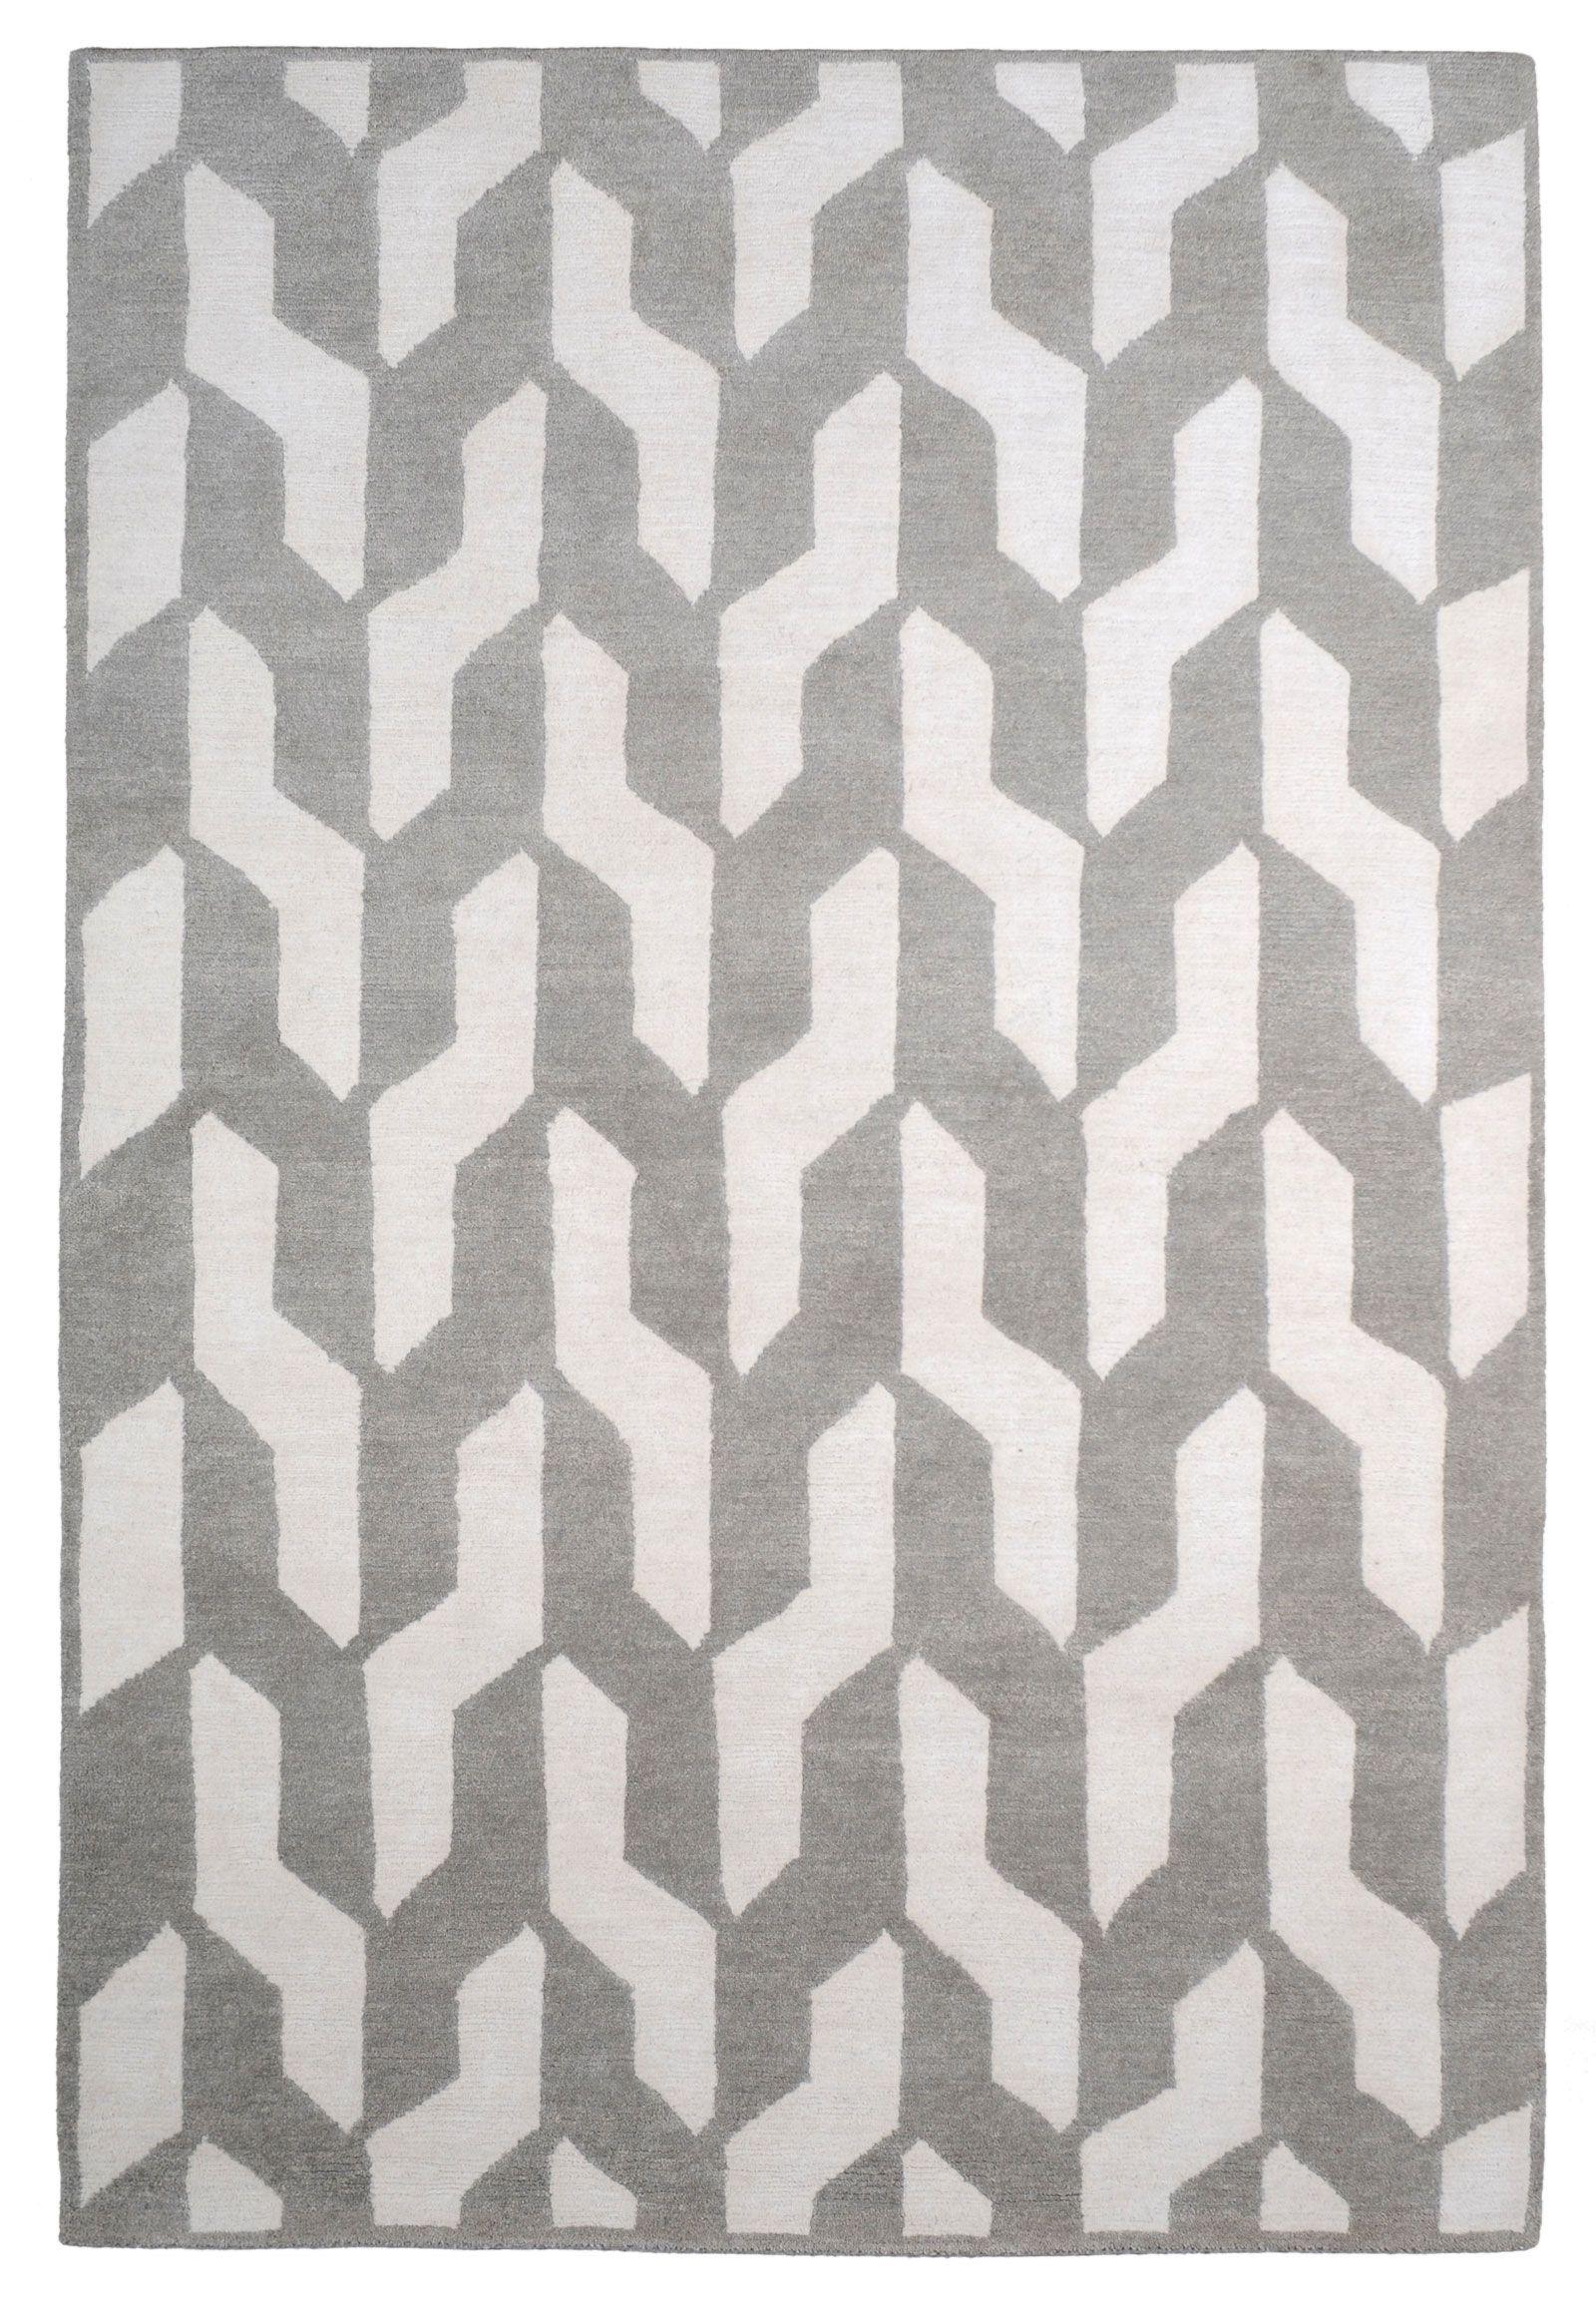 Pattern Rug Rug Company Rugs Rugs On Carpet